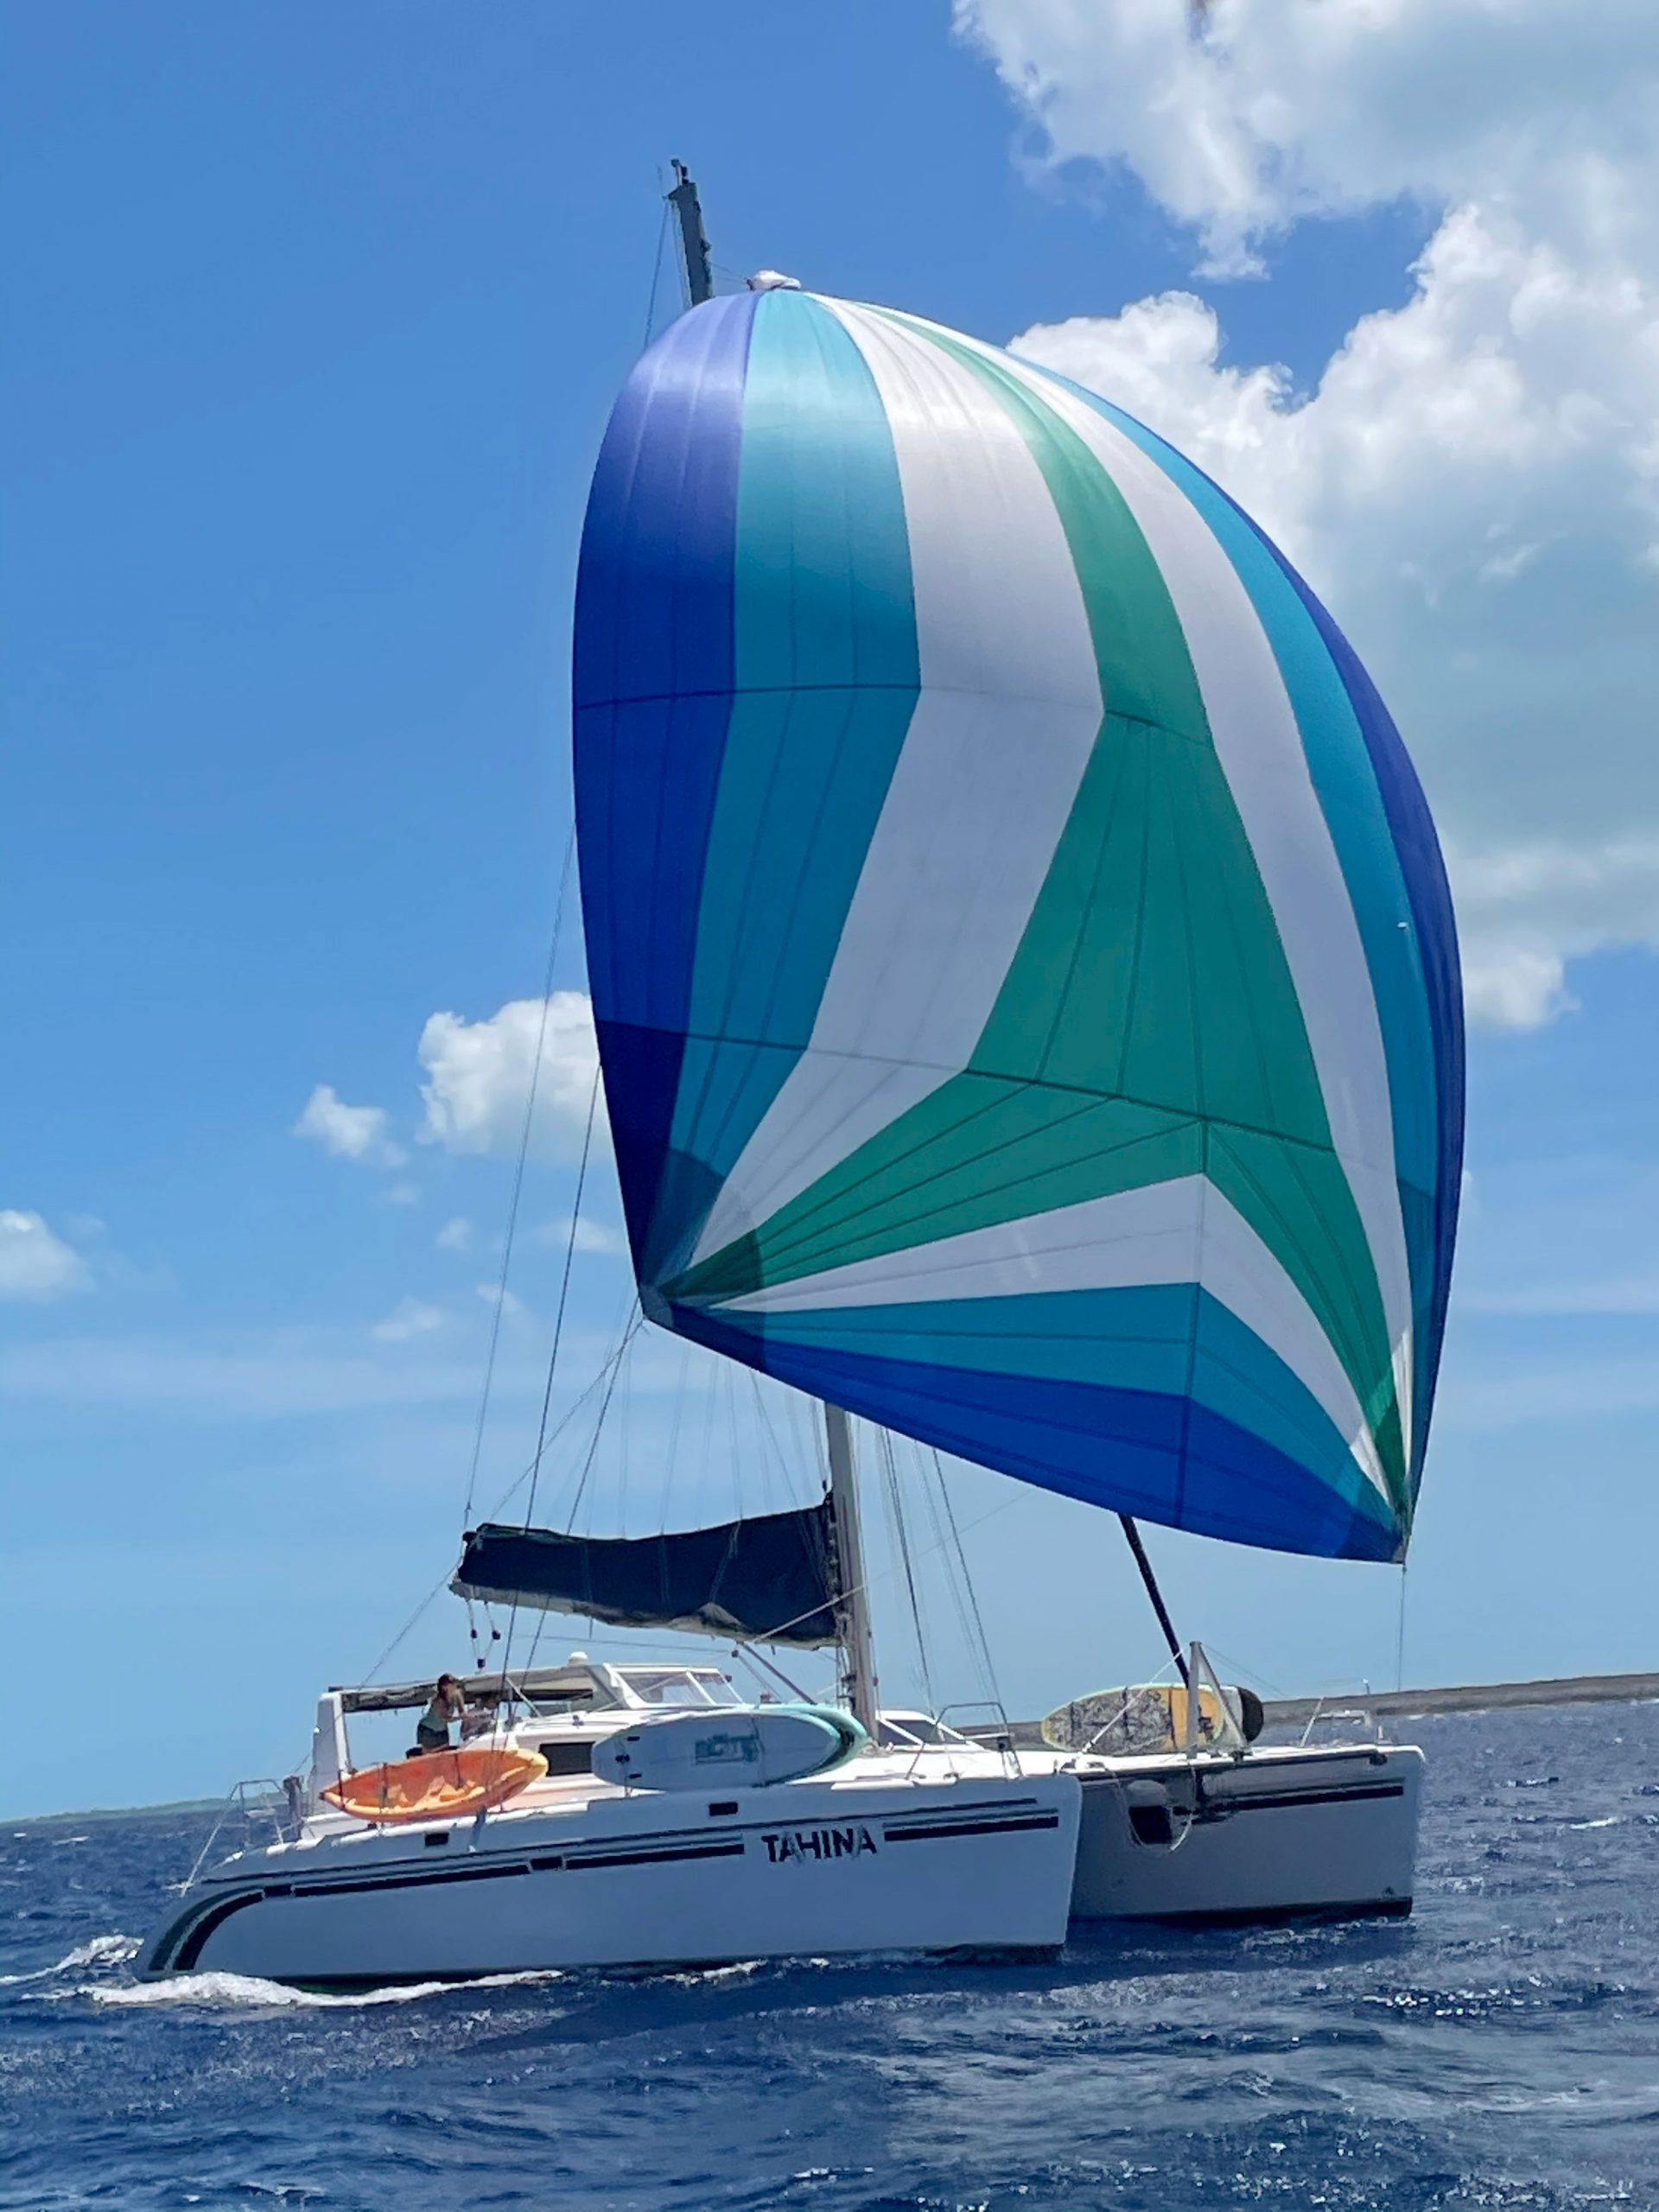 Catamaran sailing with spinnaker hoisted